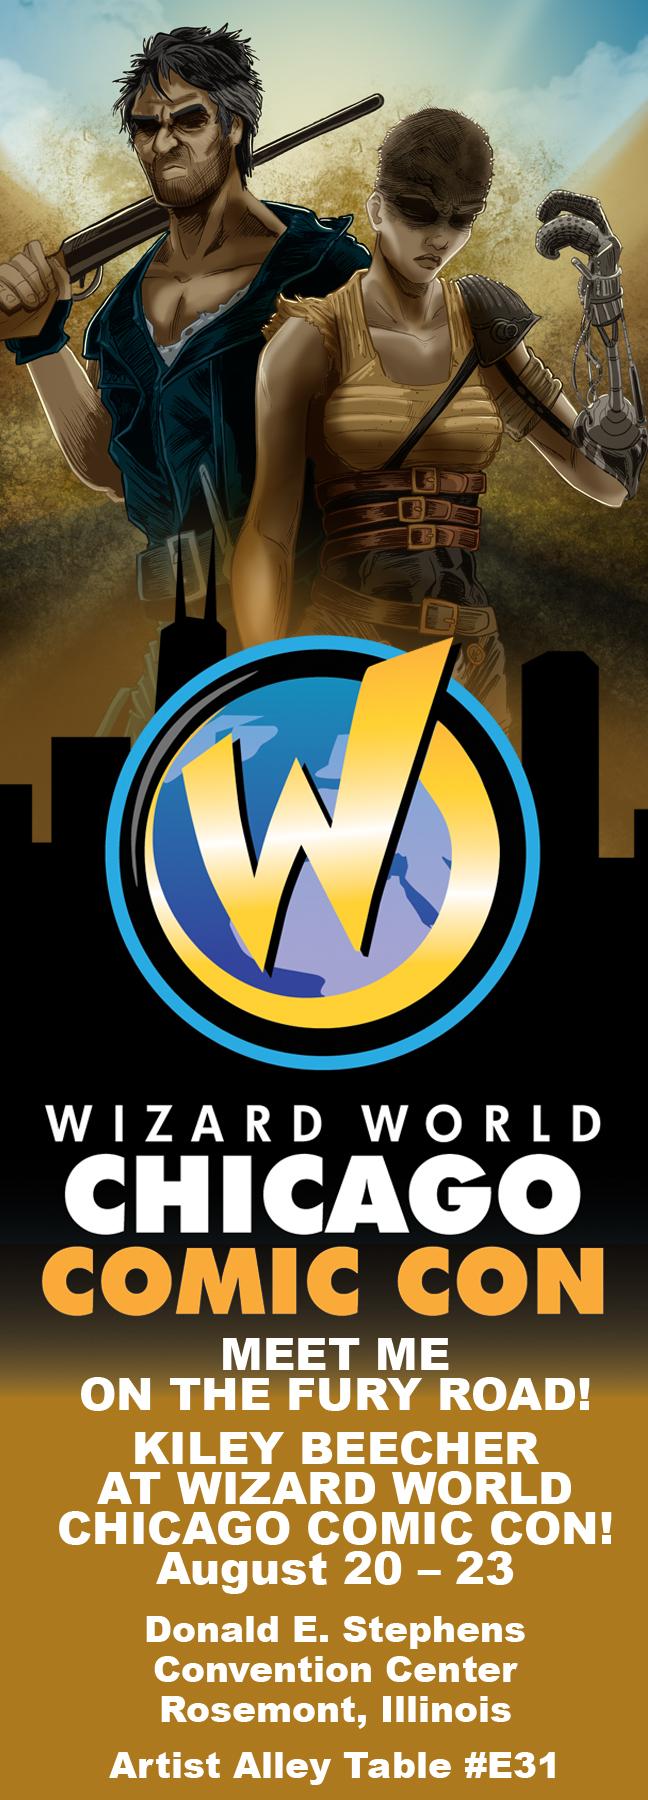 Wizard World Chicago 2015 Ad by KileyBeecher